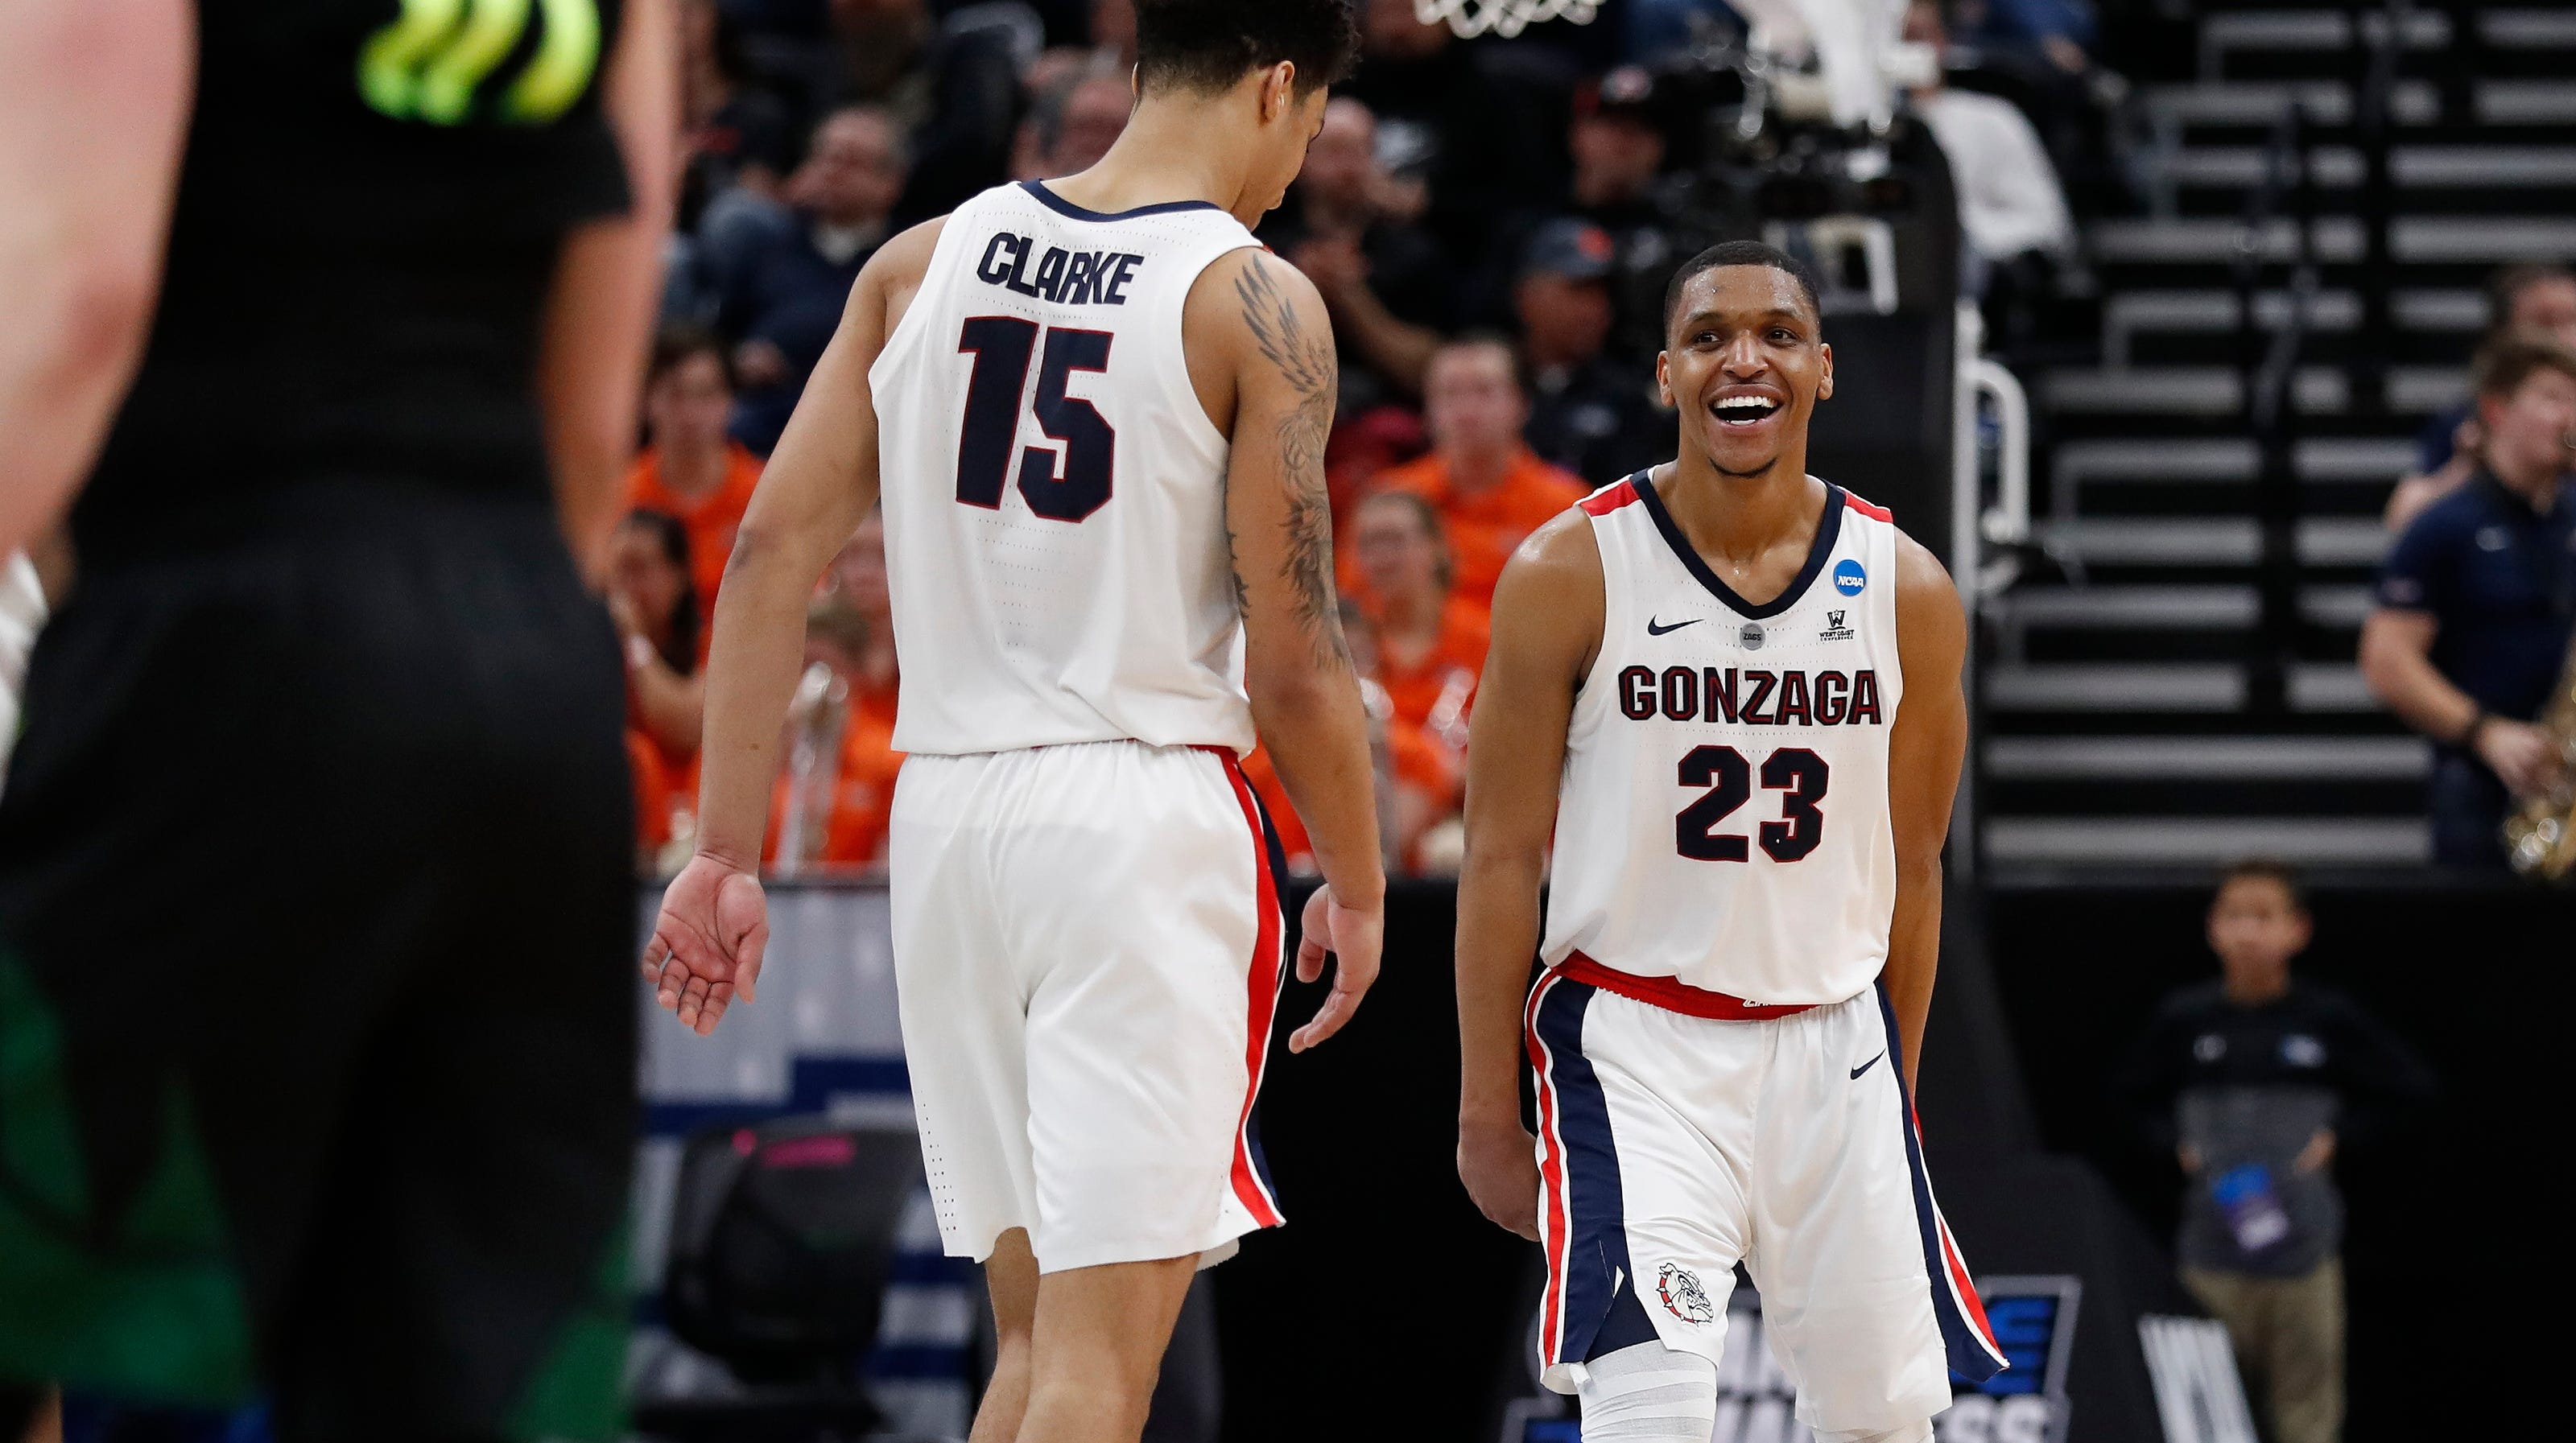 Brandon Clarke Gonzaga Bulldogs Basketball Jersey-Navy